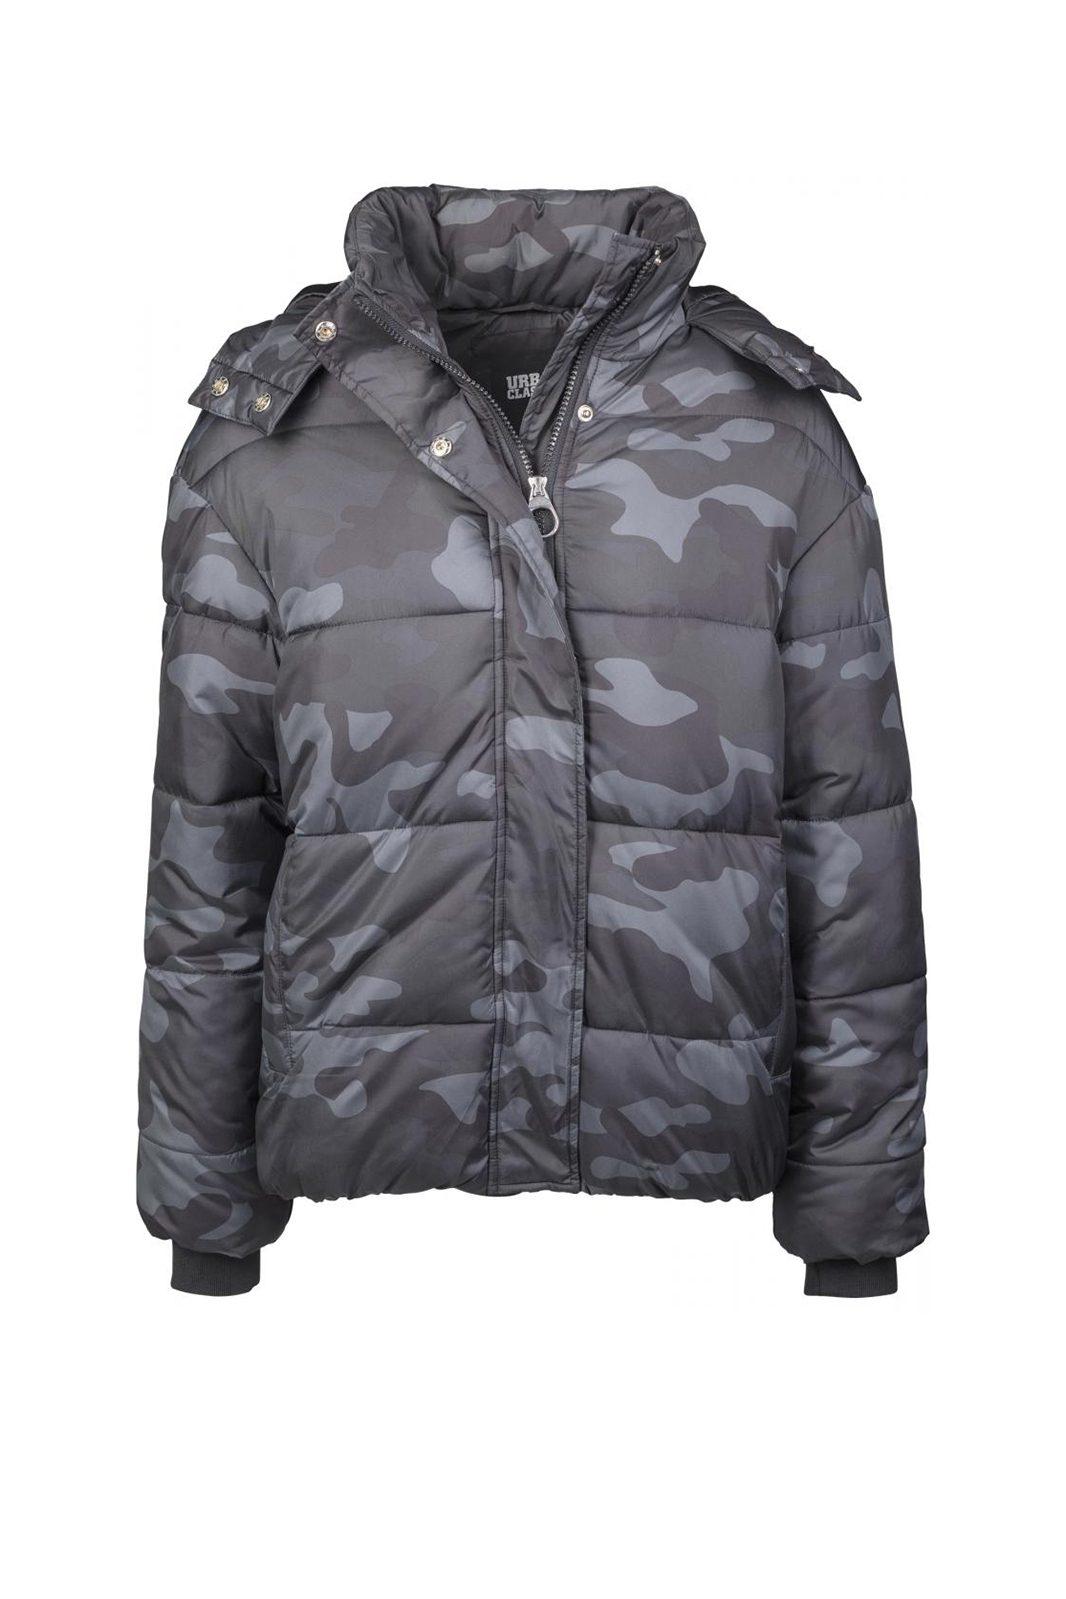 Boyfriend Dark Camo Puffer Jacket Camo